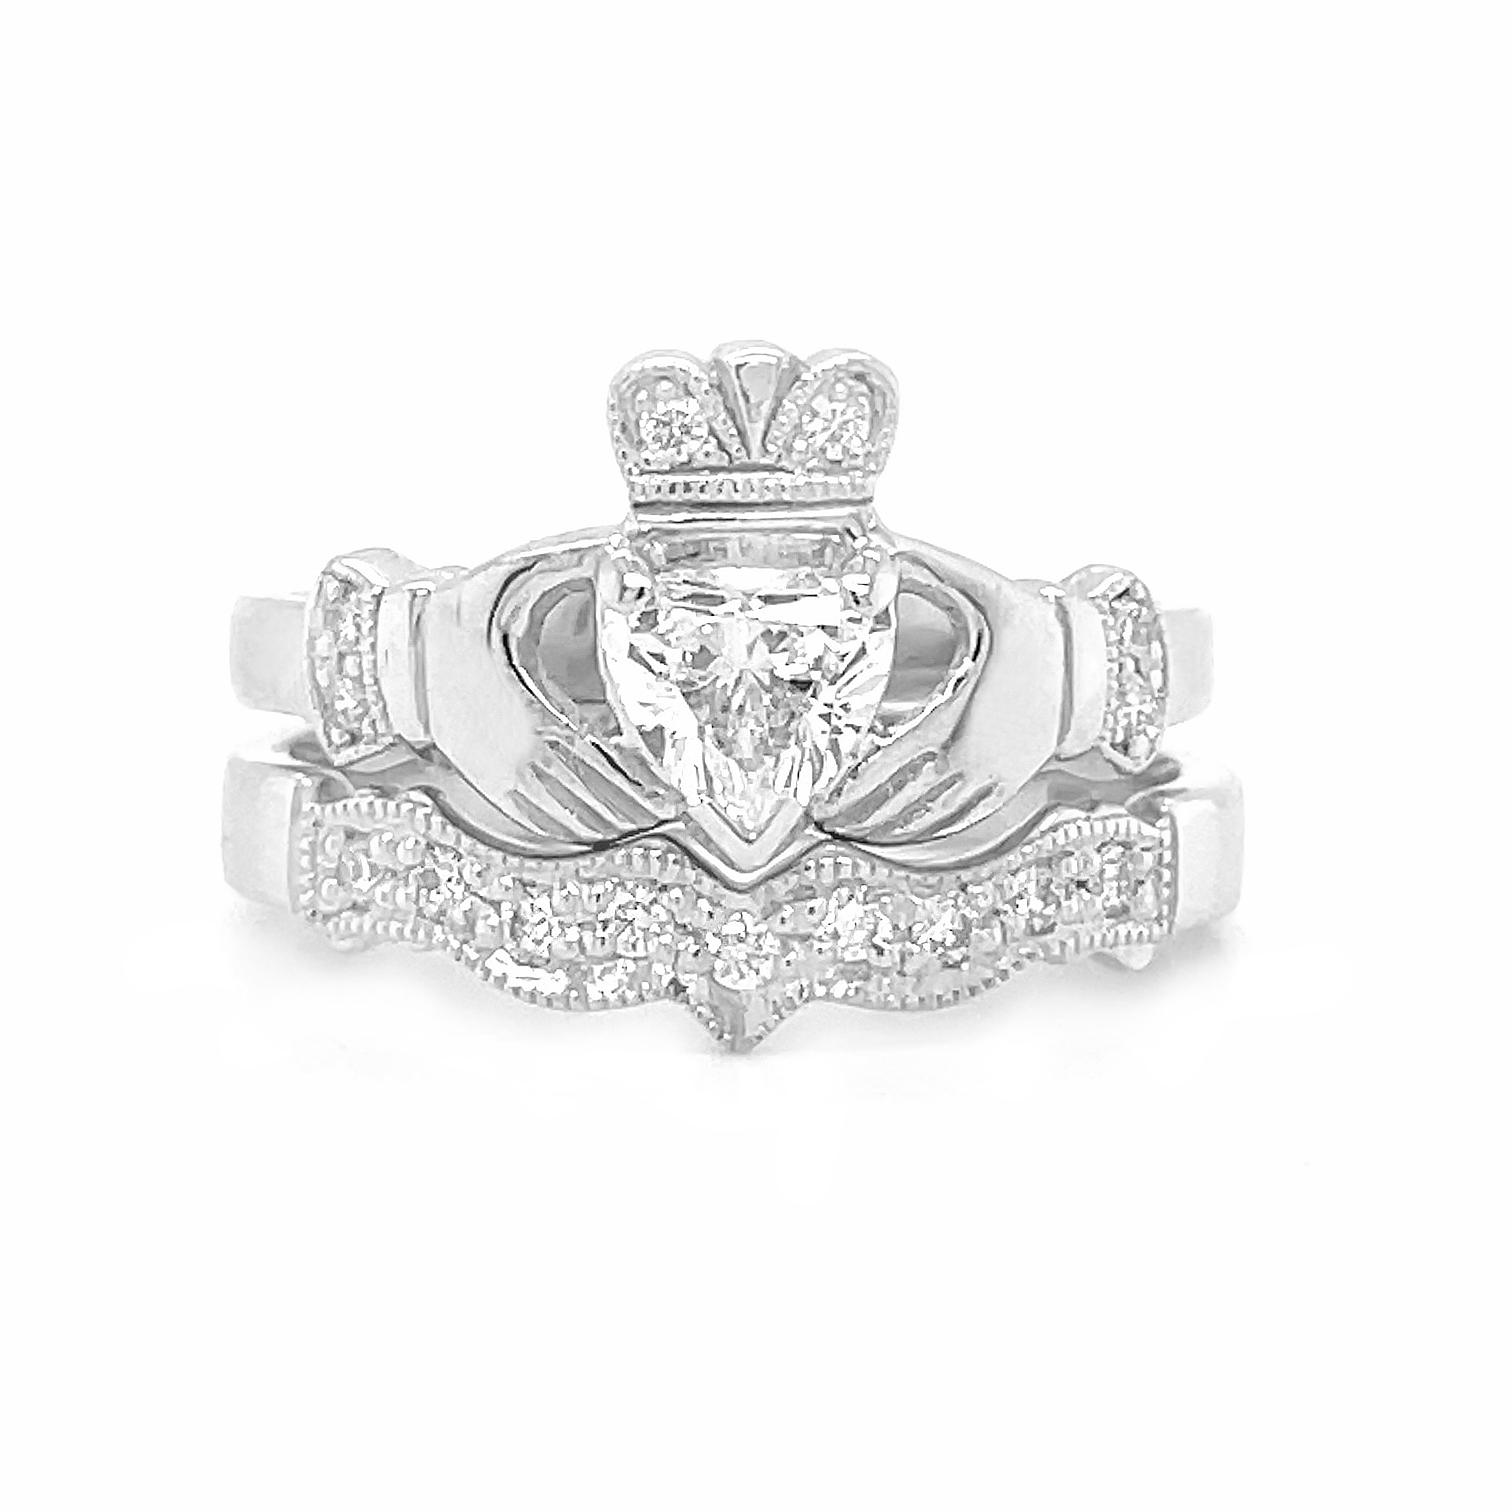 Heart-Shaped 0.50 Carat Diamond Claddagh Ring Set